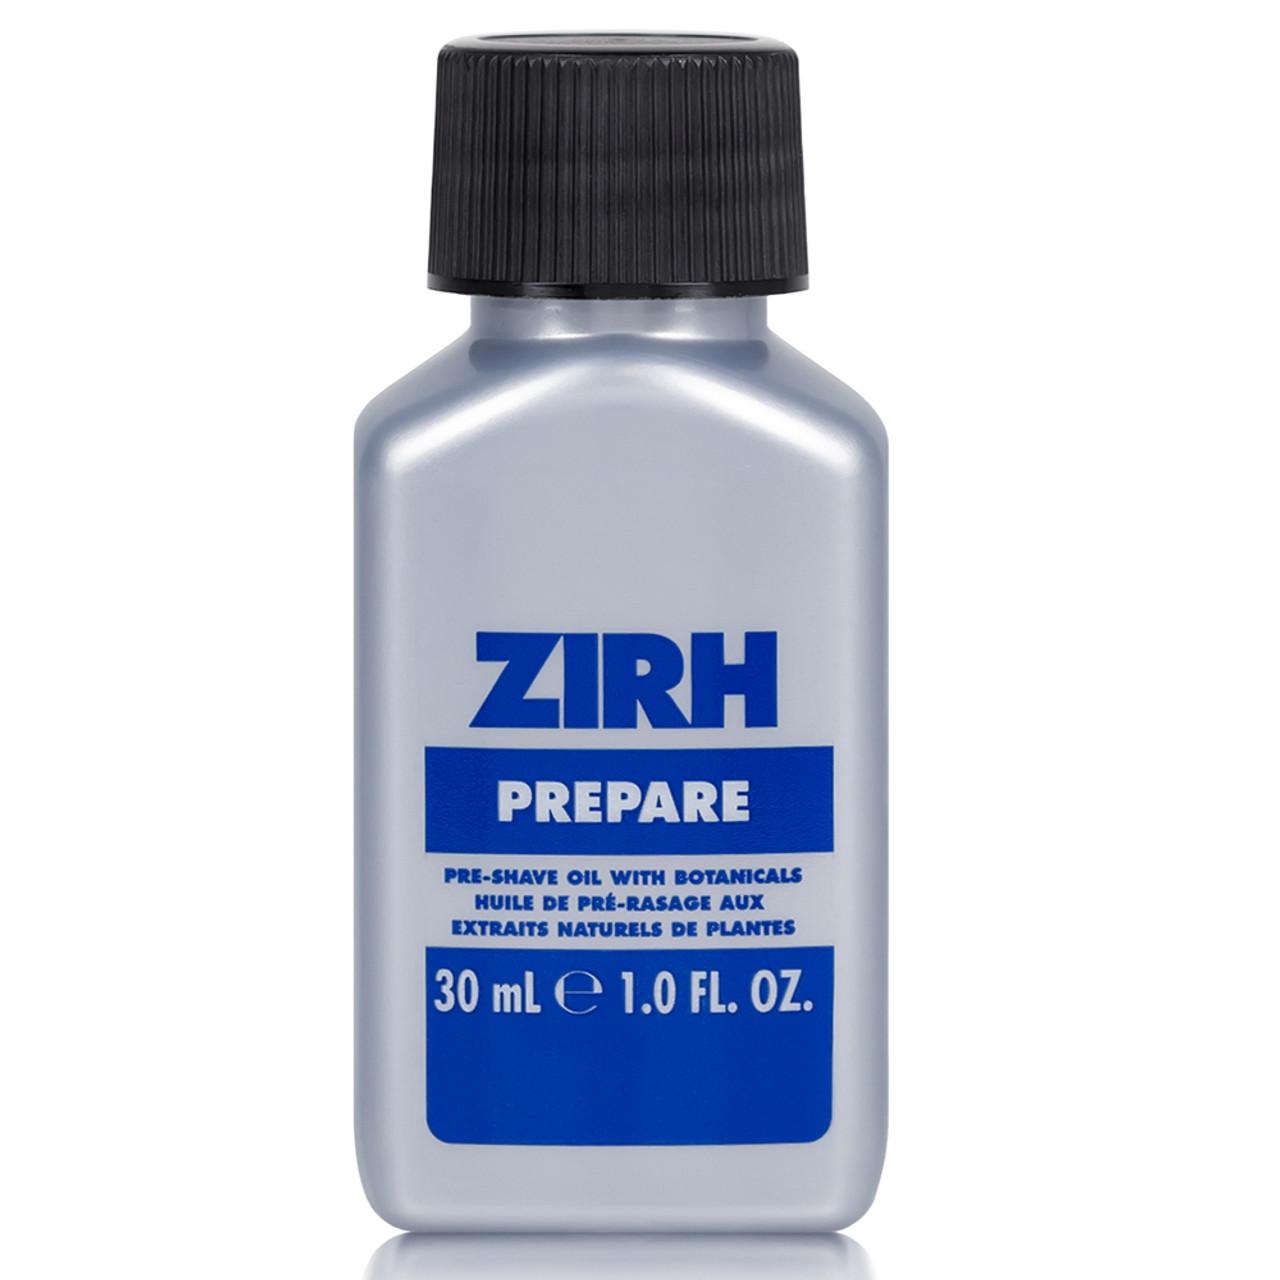 ZIRH Prepare Botanical Pre-Shave Oil